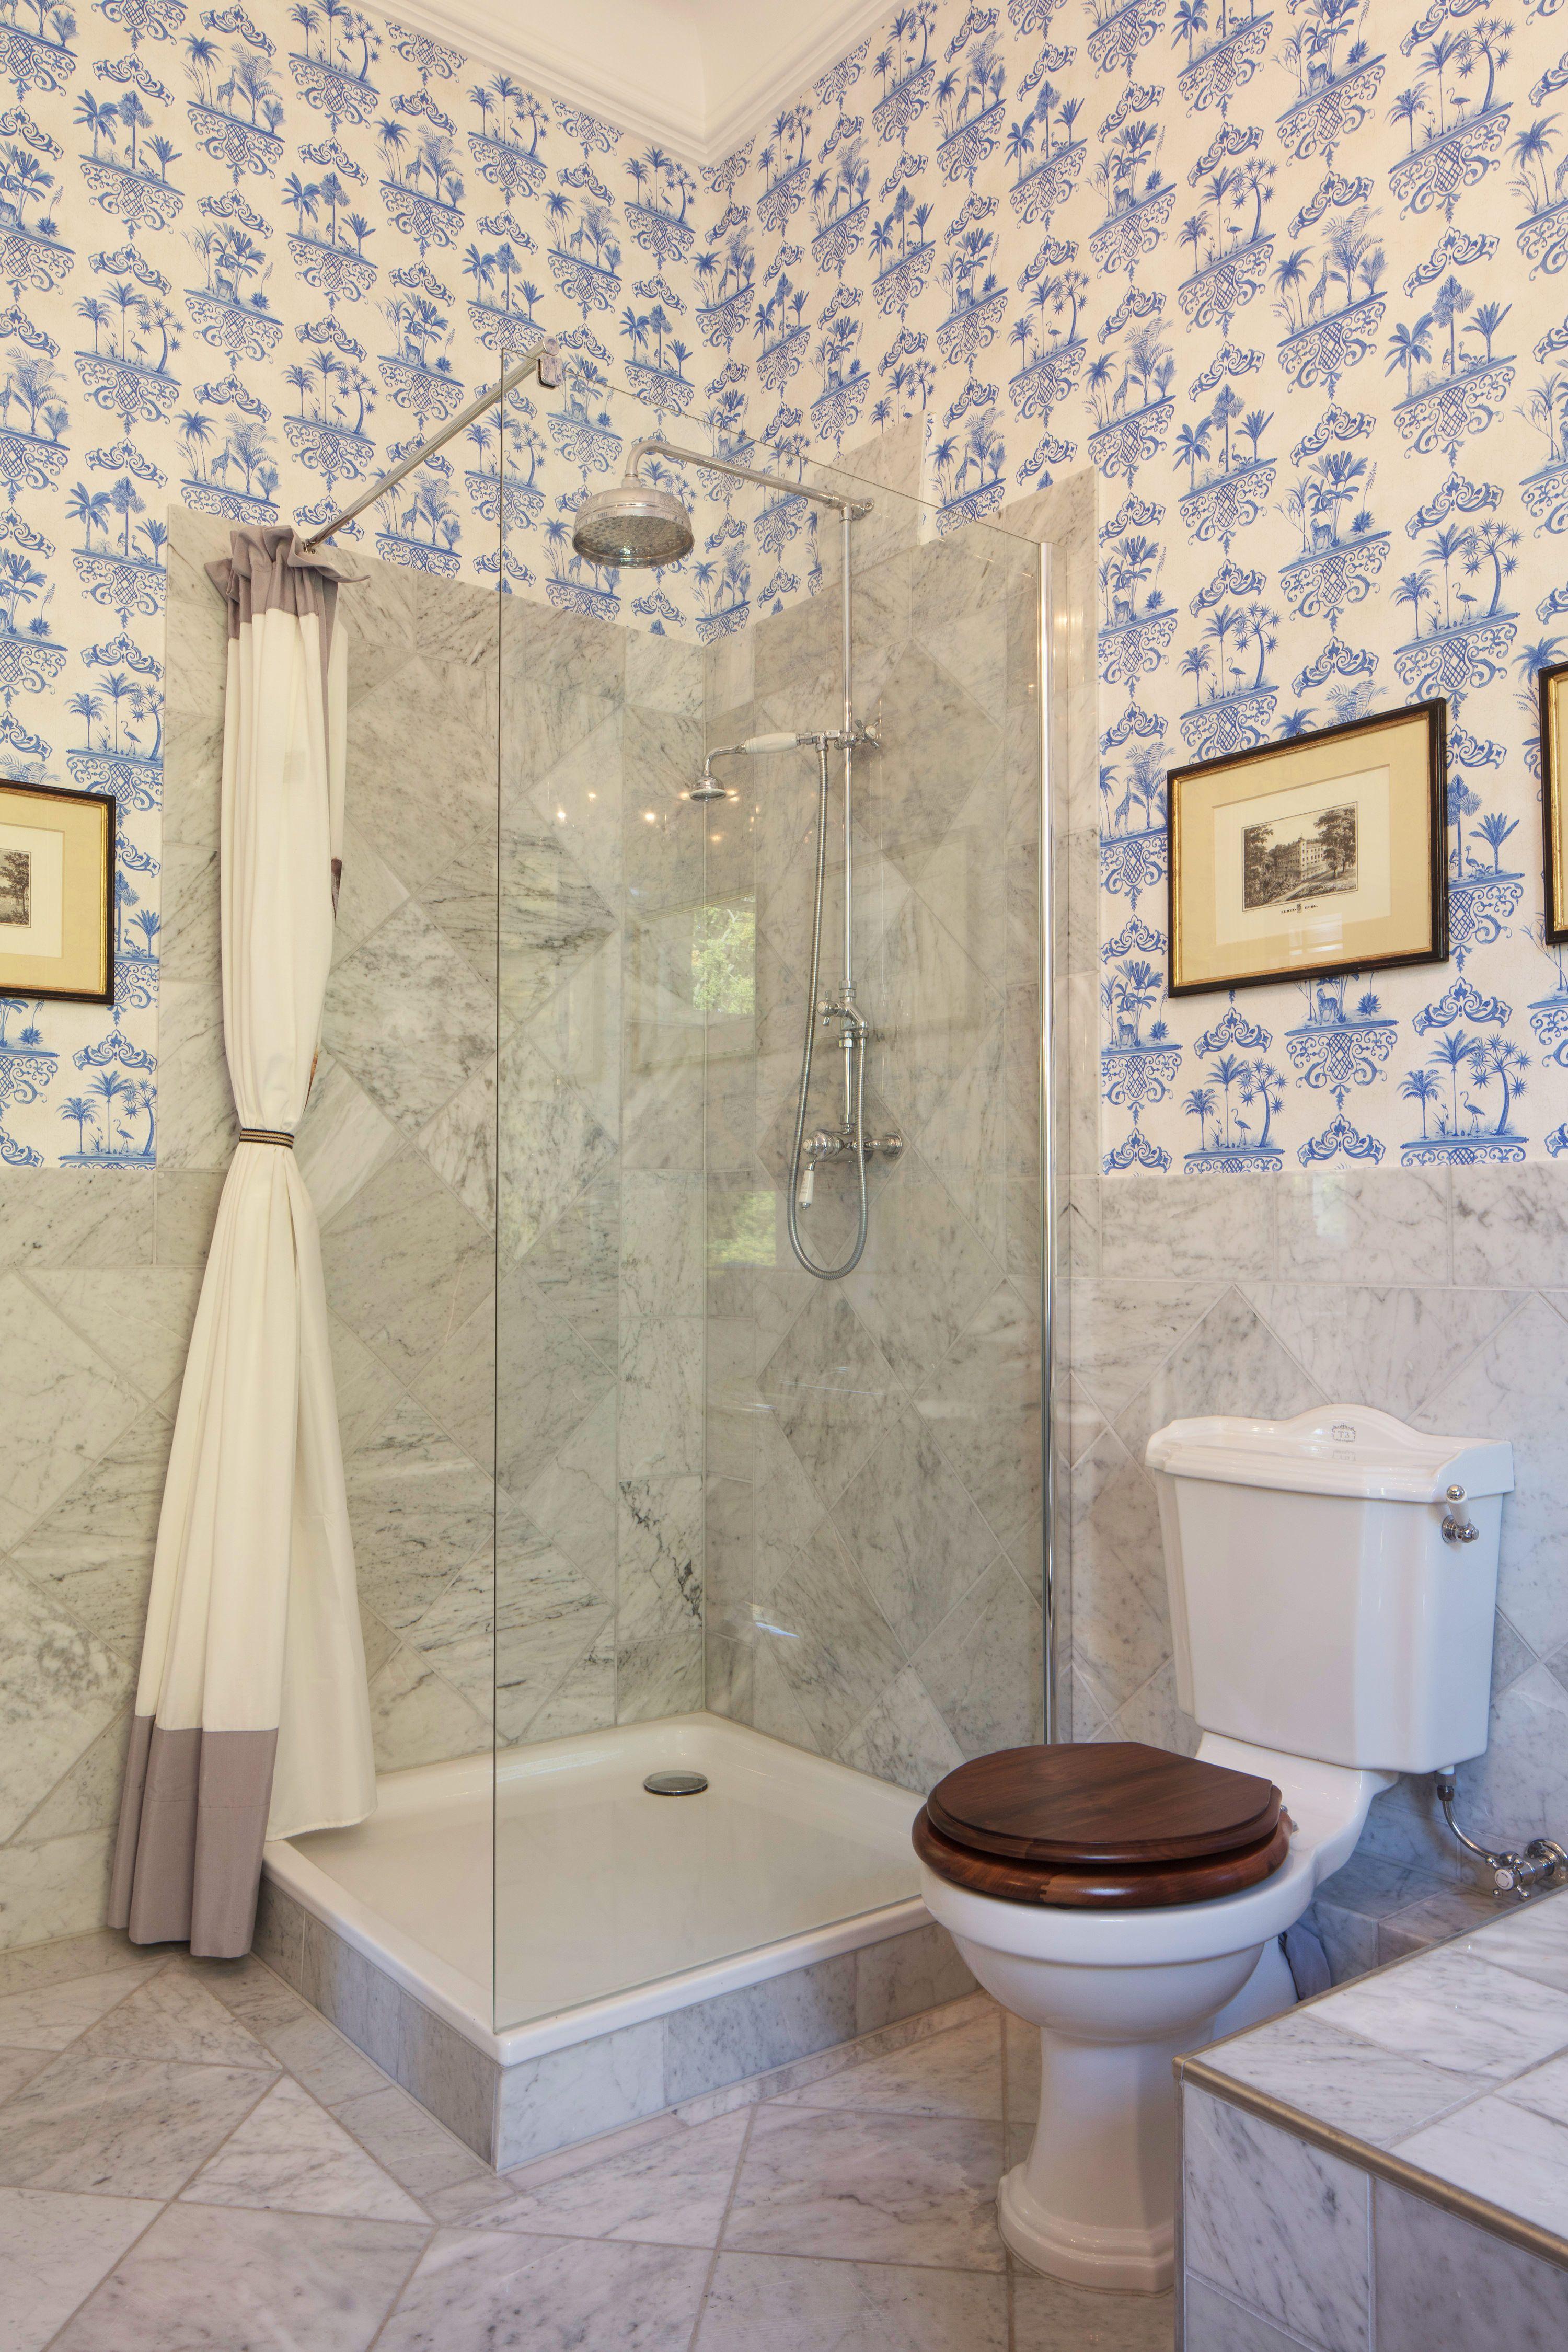 Nostalgie Badezimmer Vintage Badezimmer Traditionelle Bader Badezimmer